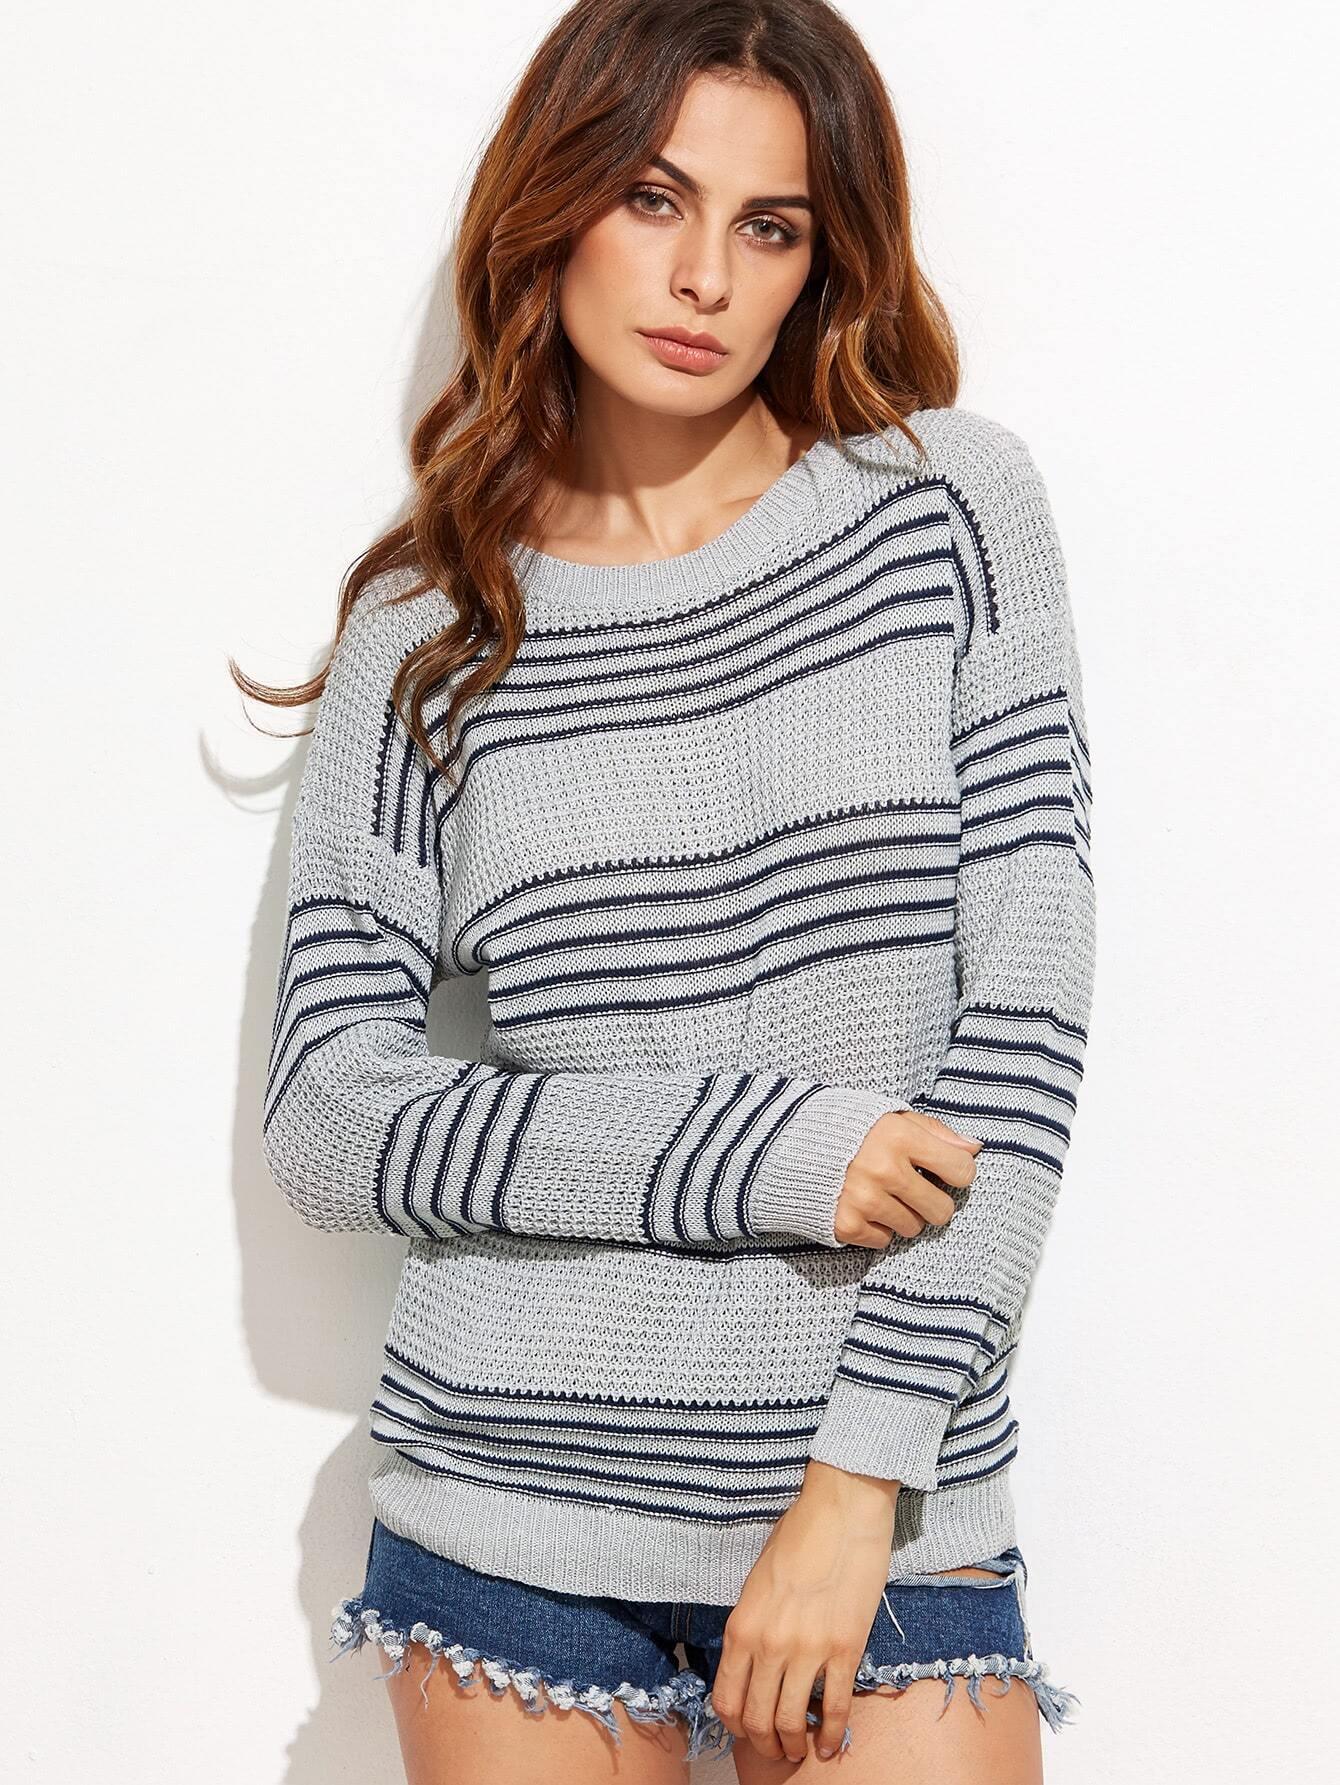 Grey Striped Drop Shoulder Seam Sweater sweater160914458